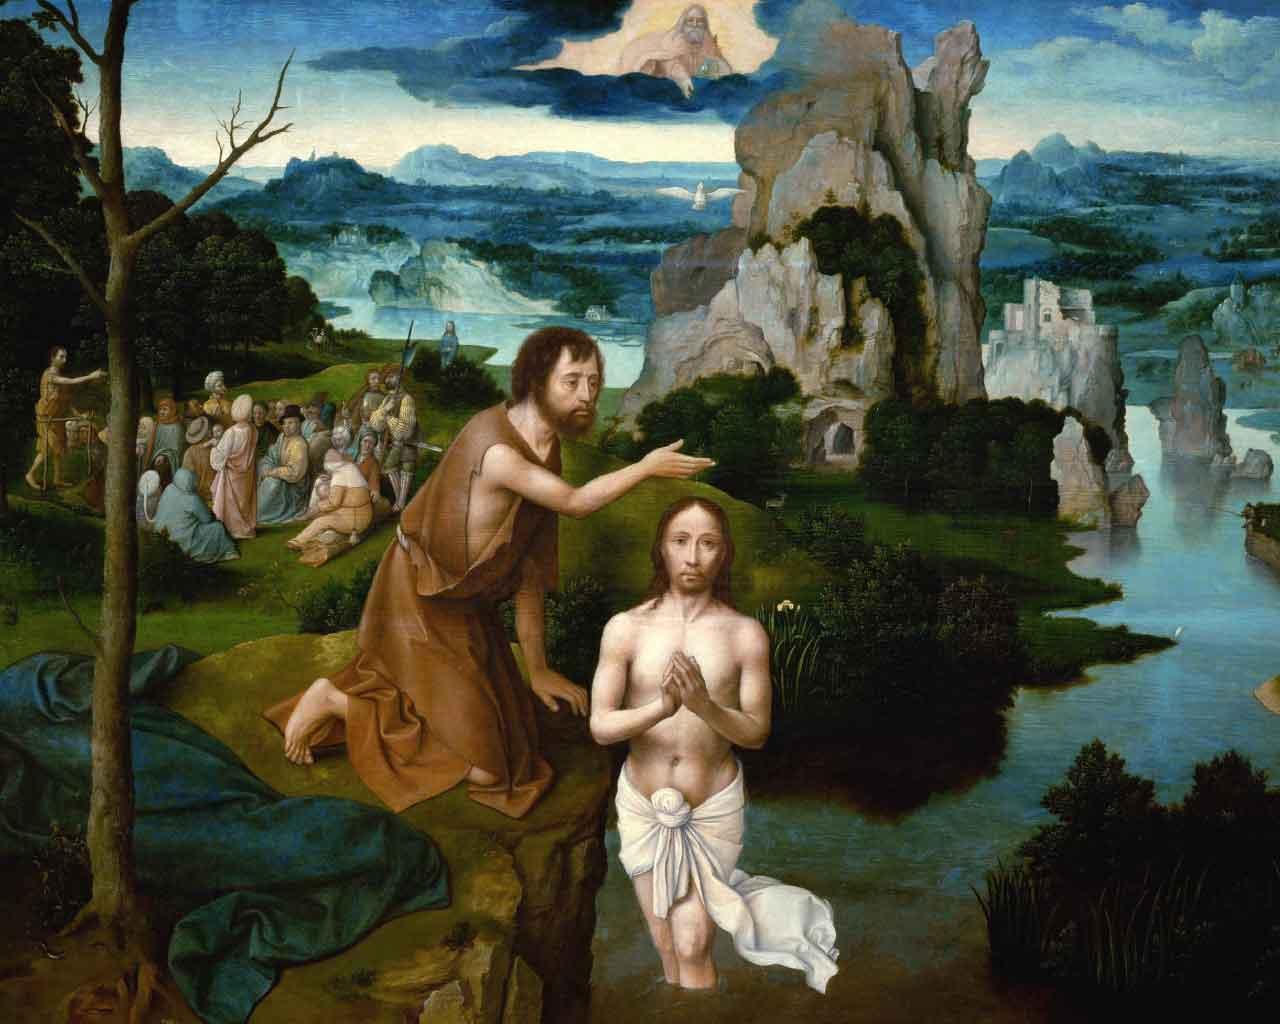 sermon illustration the Baptism of Christ by Joachim Patinir